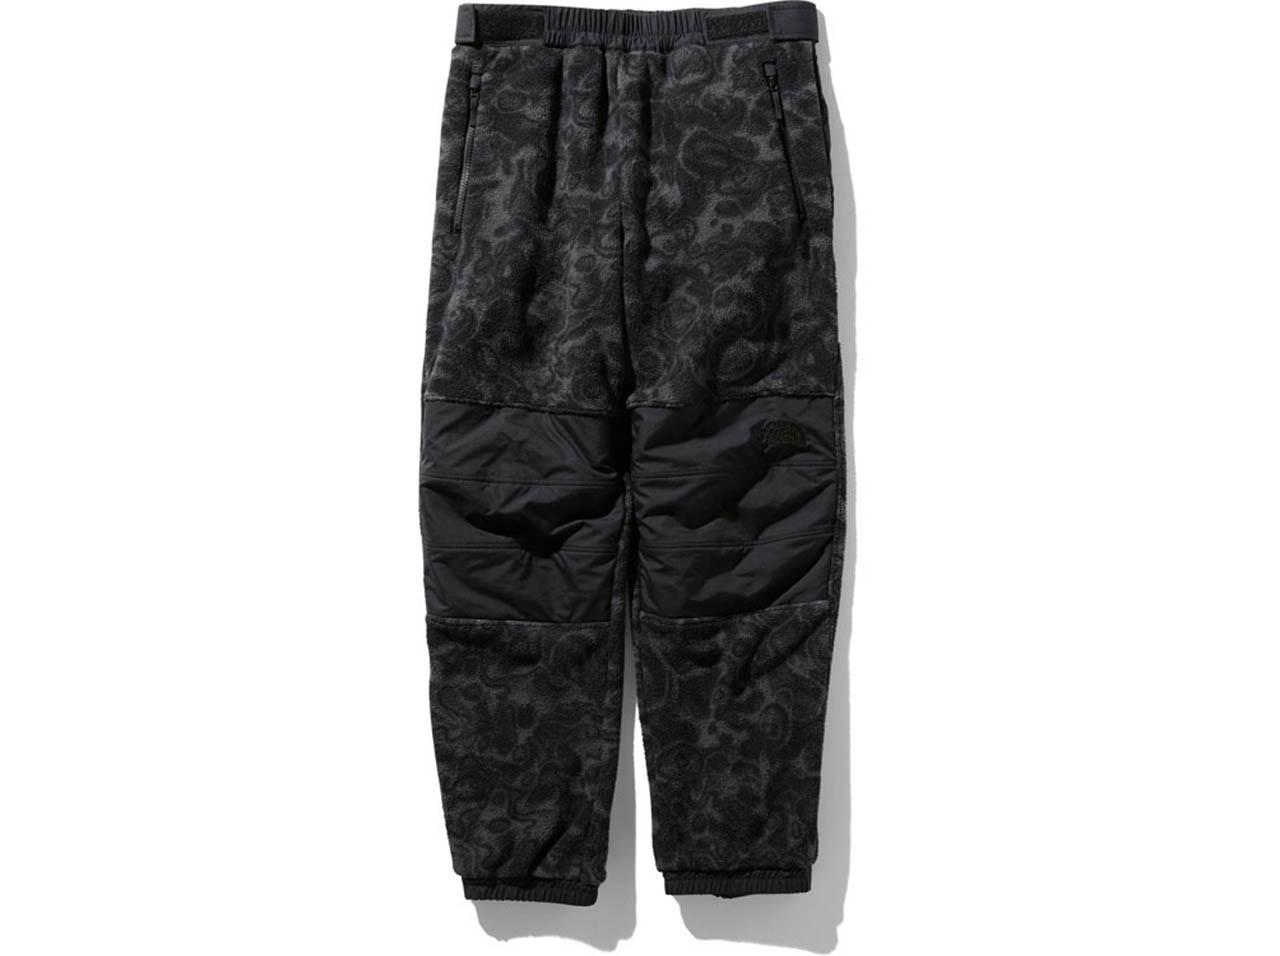 THE NORTH FACE 94 RAGE Classic Fleece Pant(NB81961)【ザ ノースフェース】【メンズファッション】【トップス】【フードパーカー】【ストアレビュー記載でソックスプレゼント対象品】